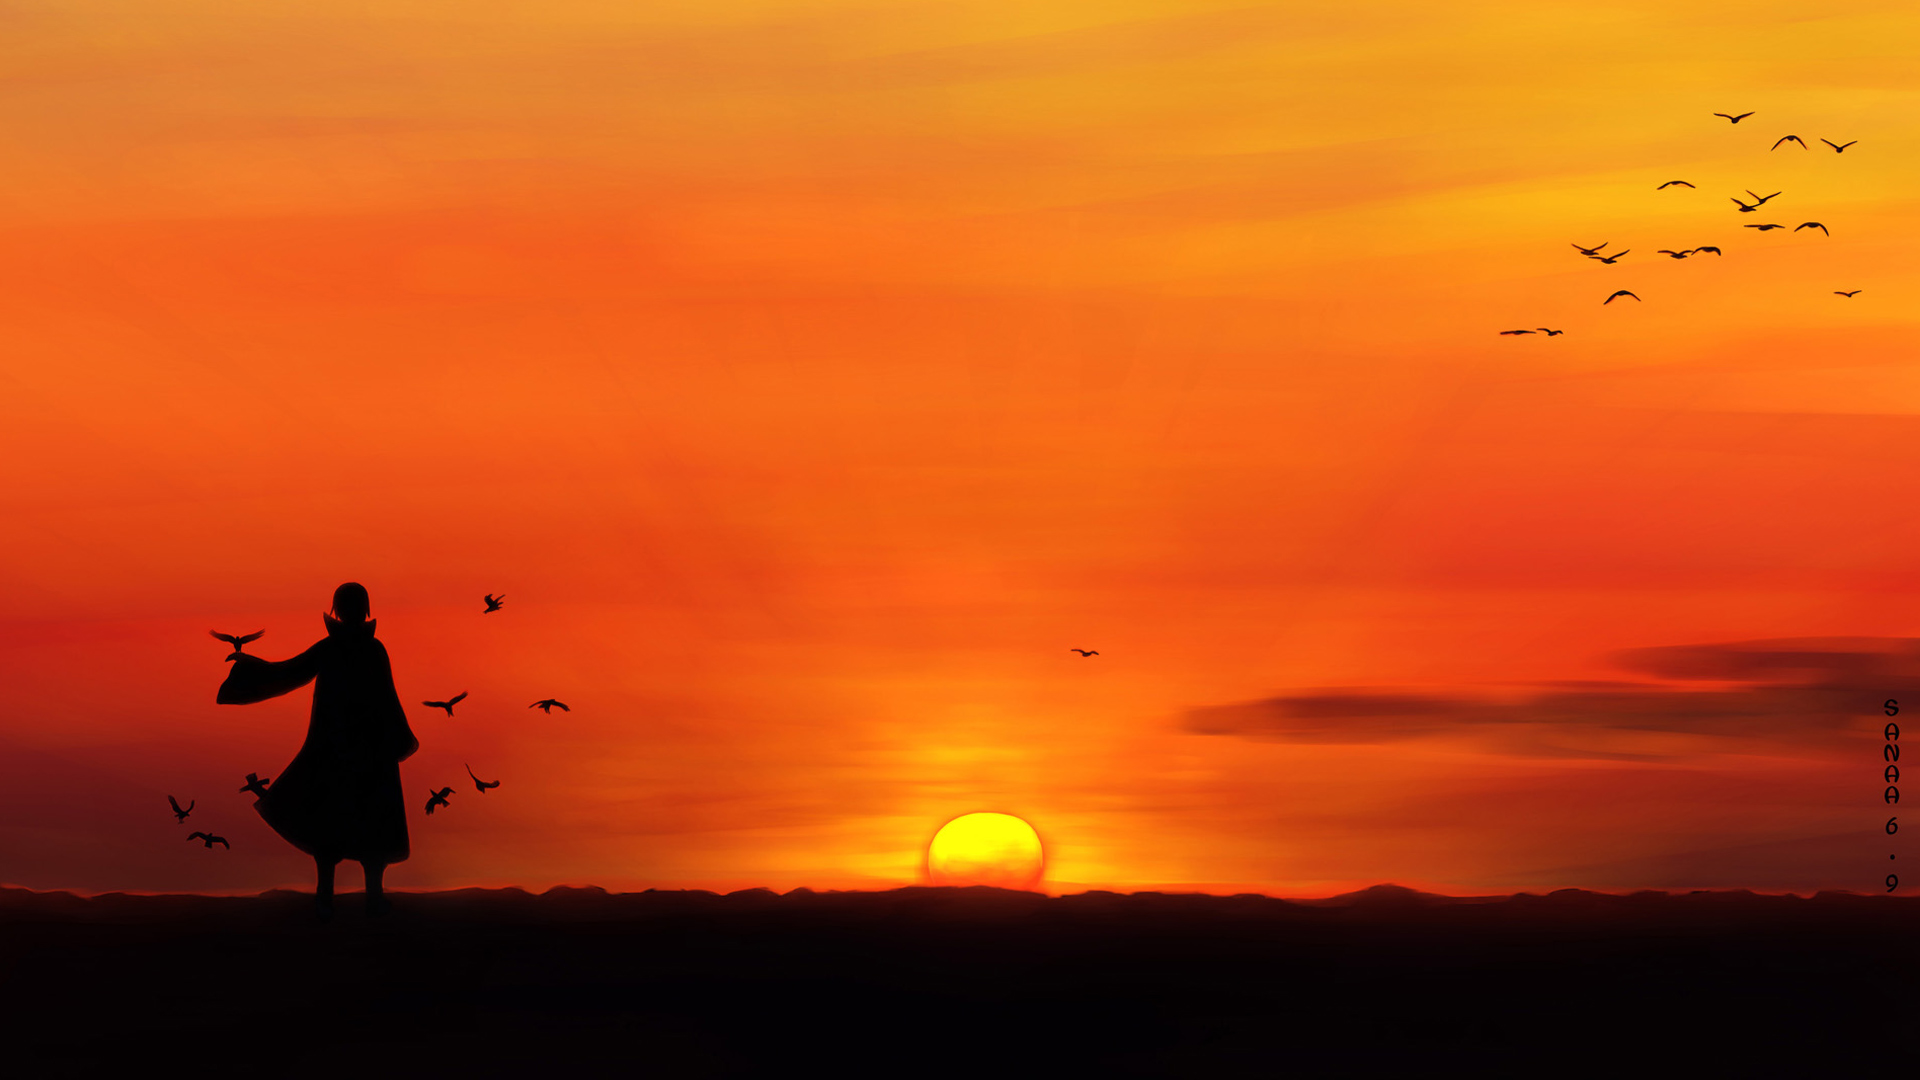 Itachi Uchiha Sunset 8i Wallpaper HD 1920x1080